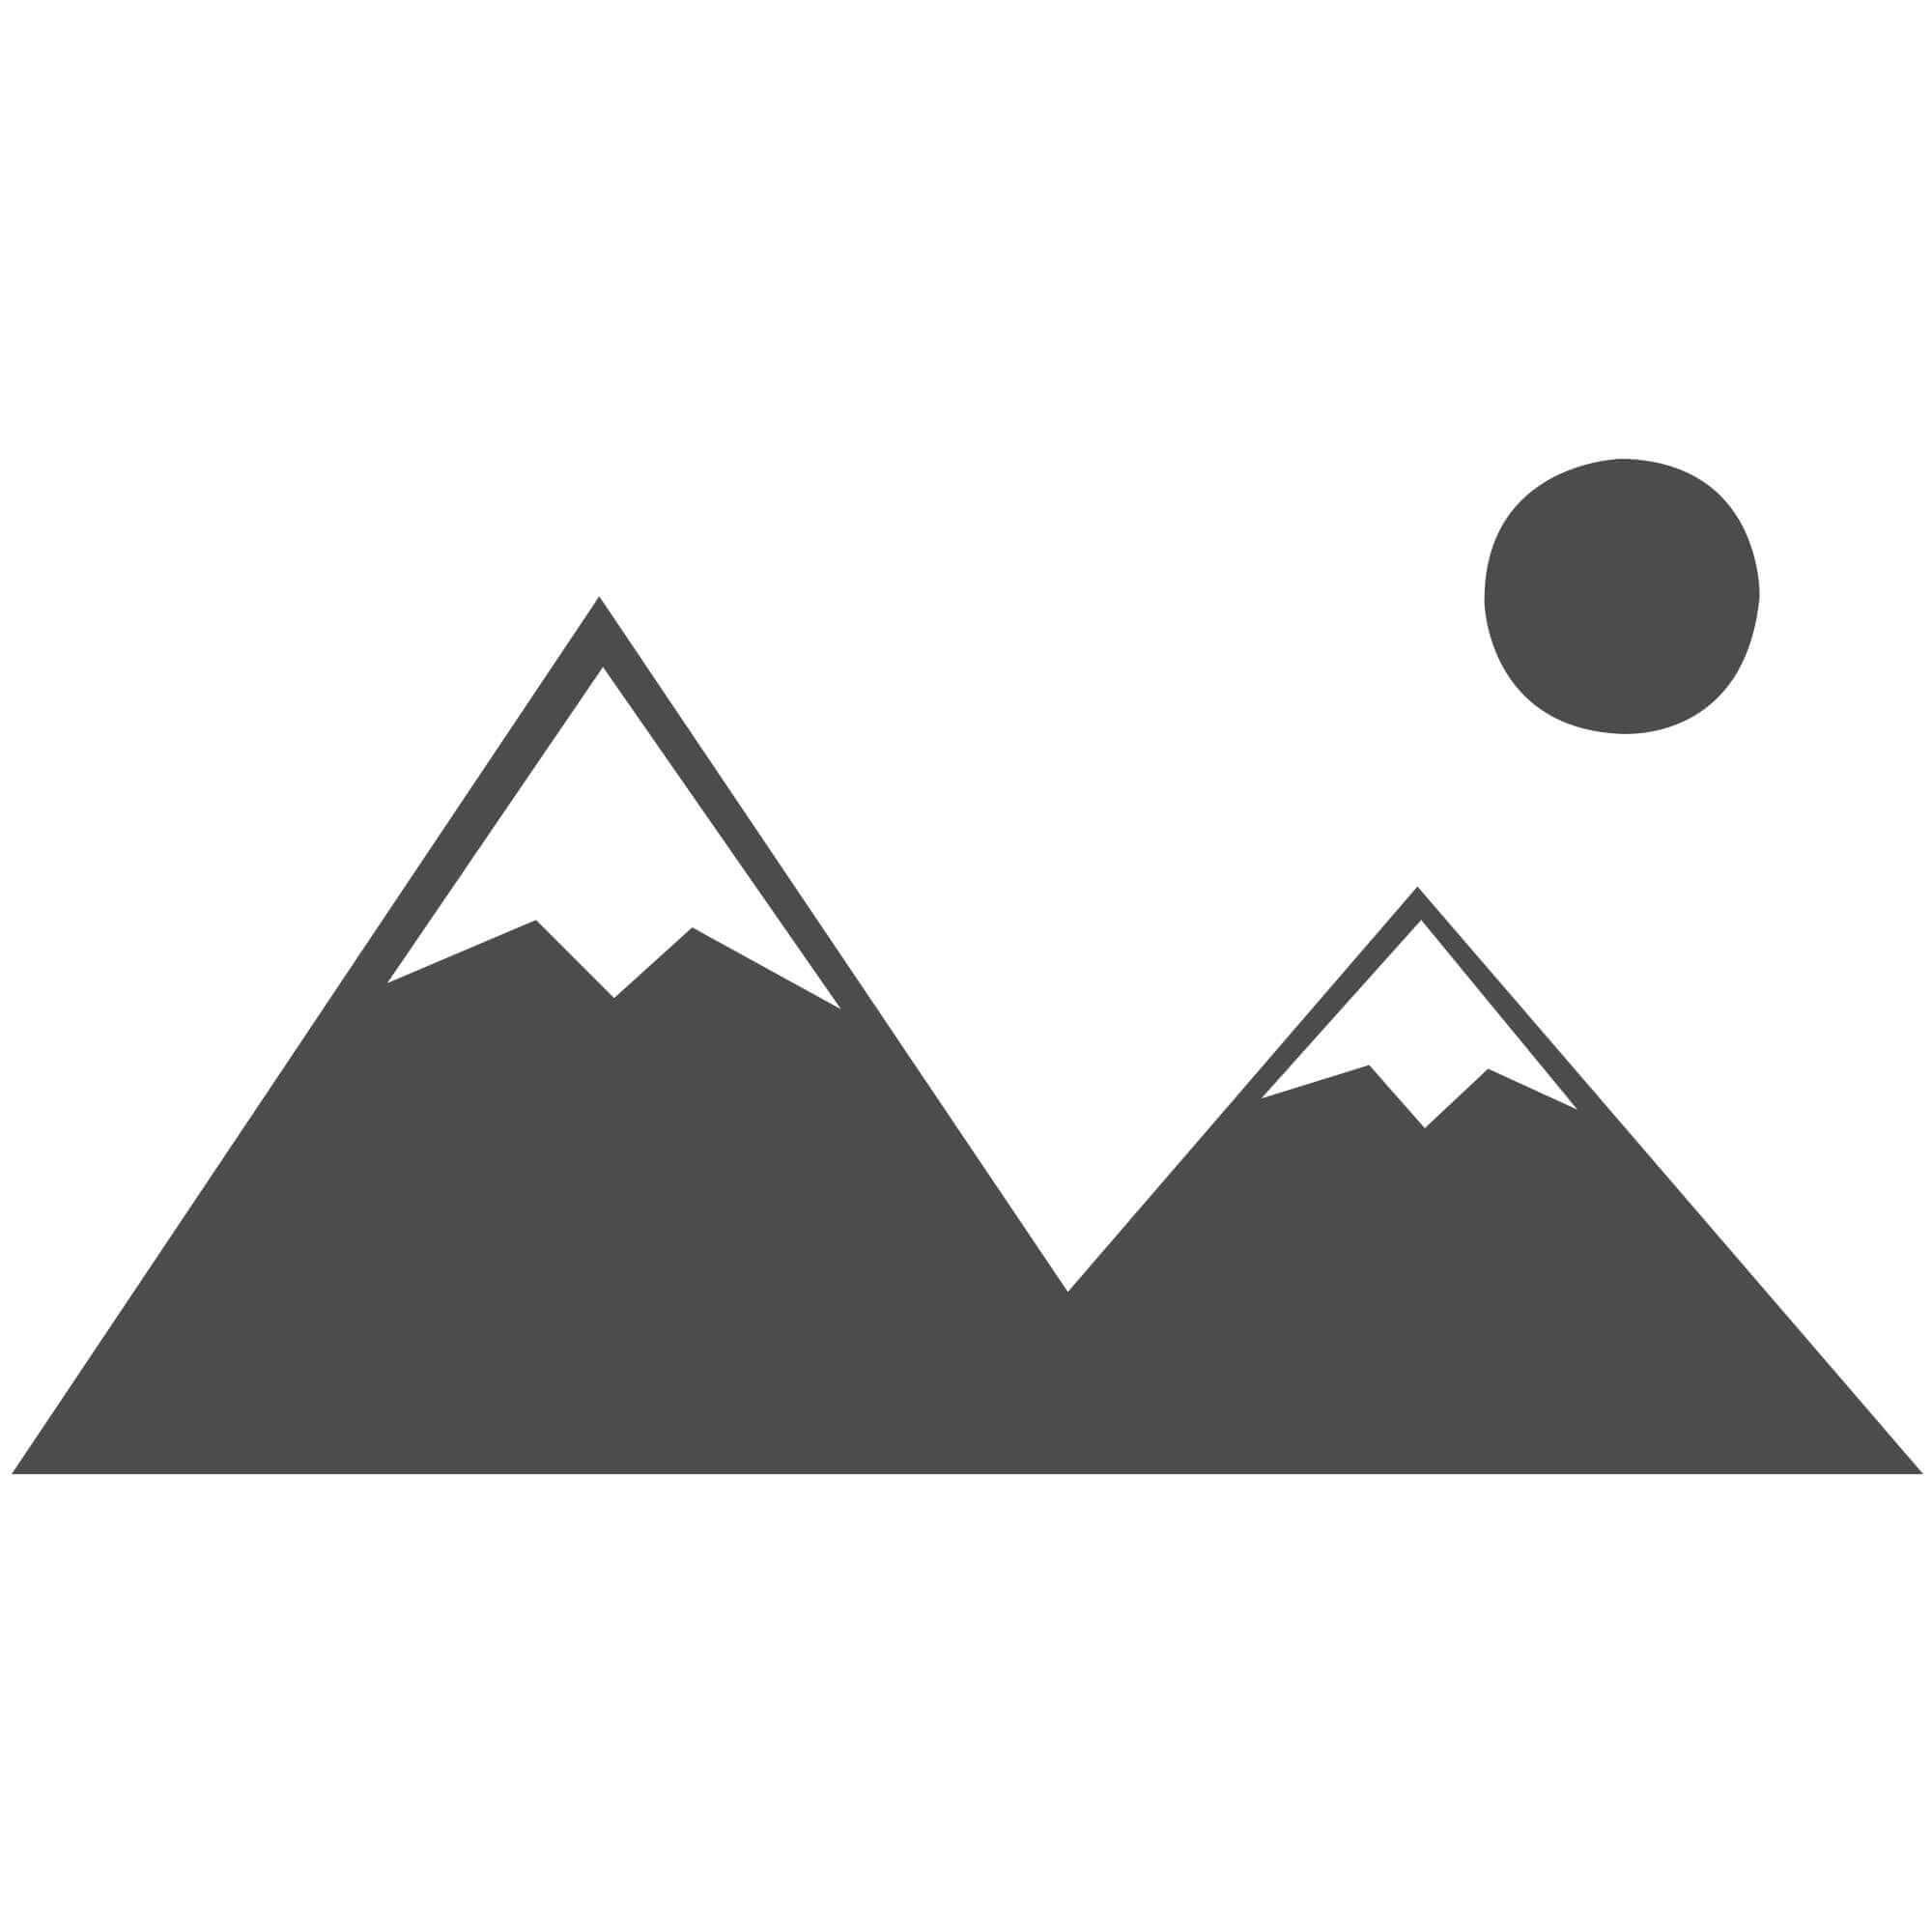 "Florence Alfresco Padua Rug - Red Beige - Size 200 x 290 cm (6'7"" x 9'6"")"